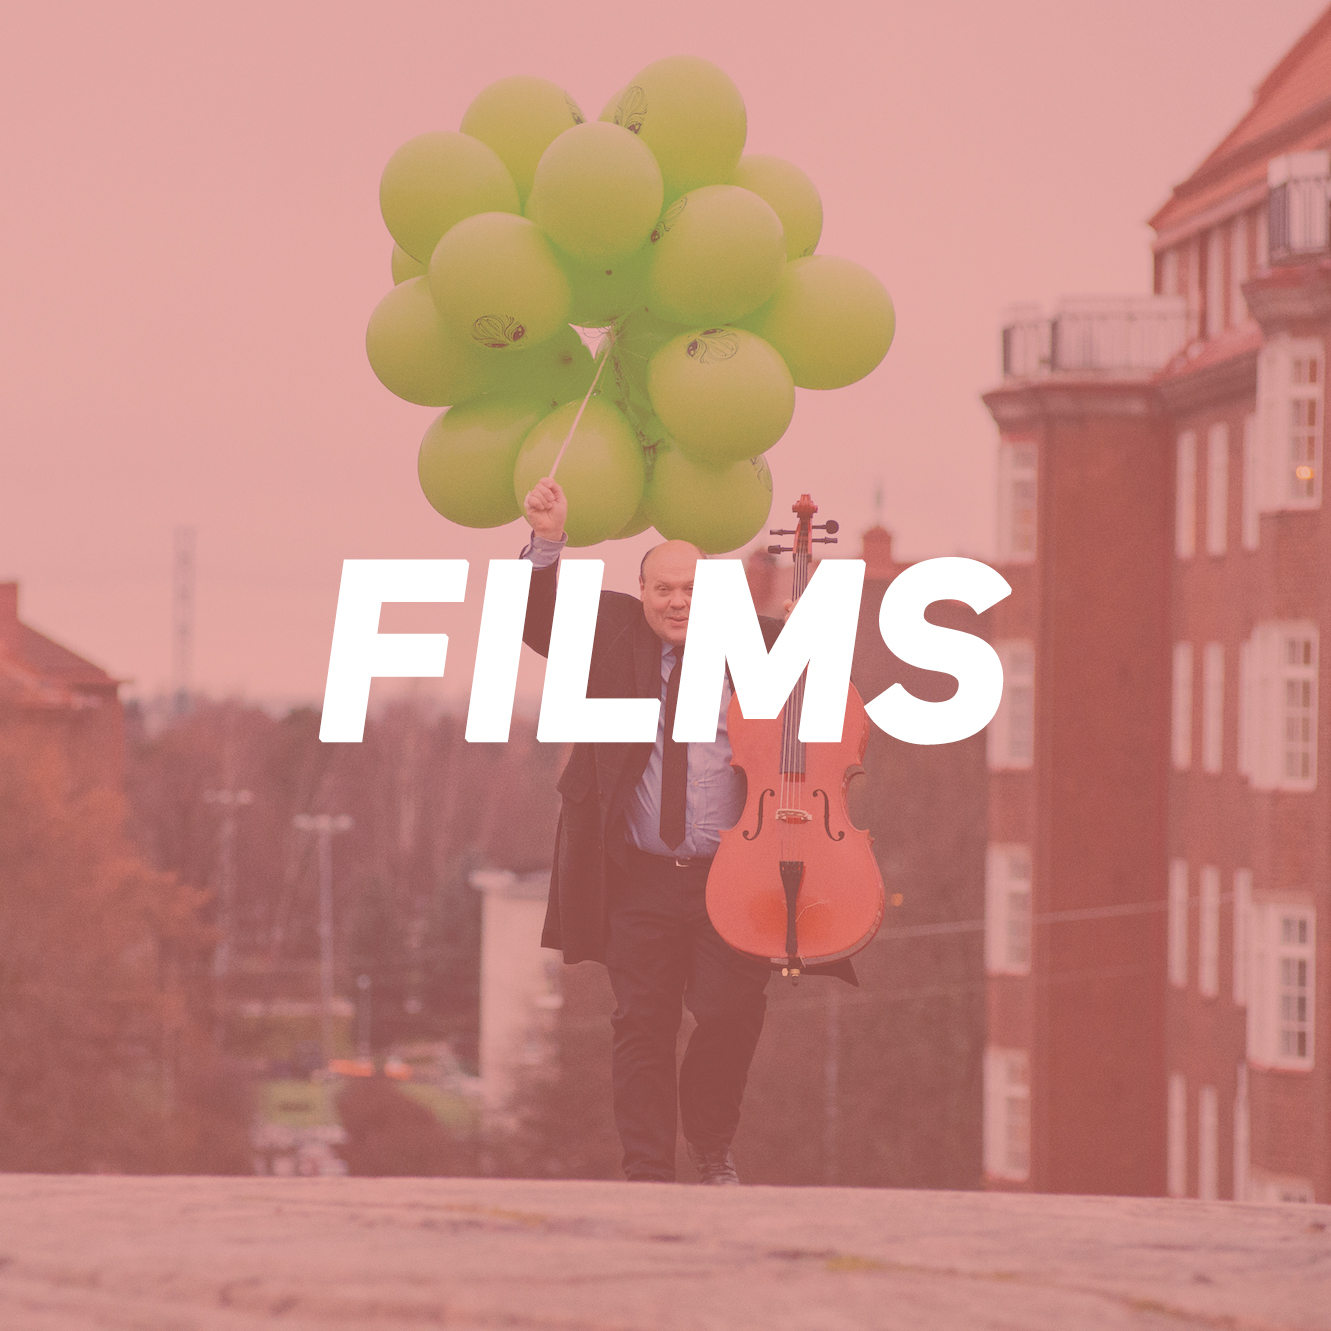 films_text.jpg